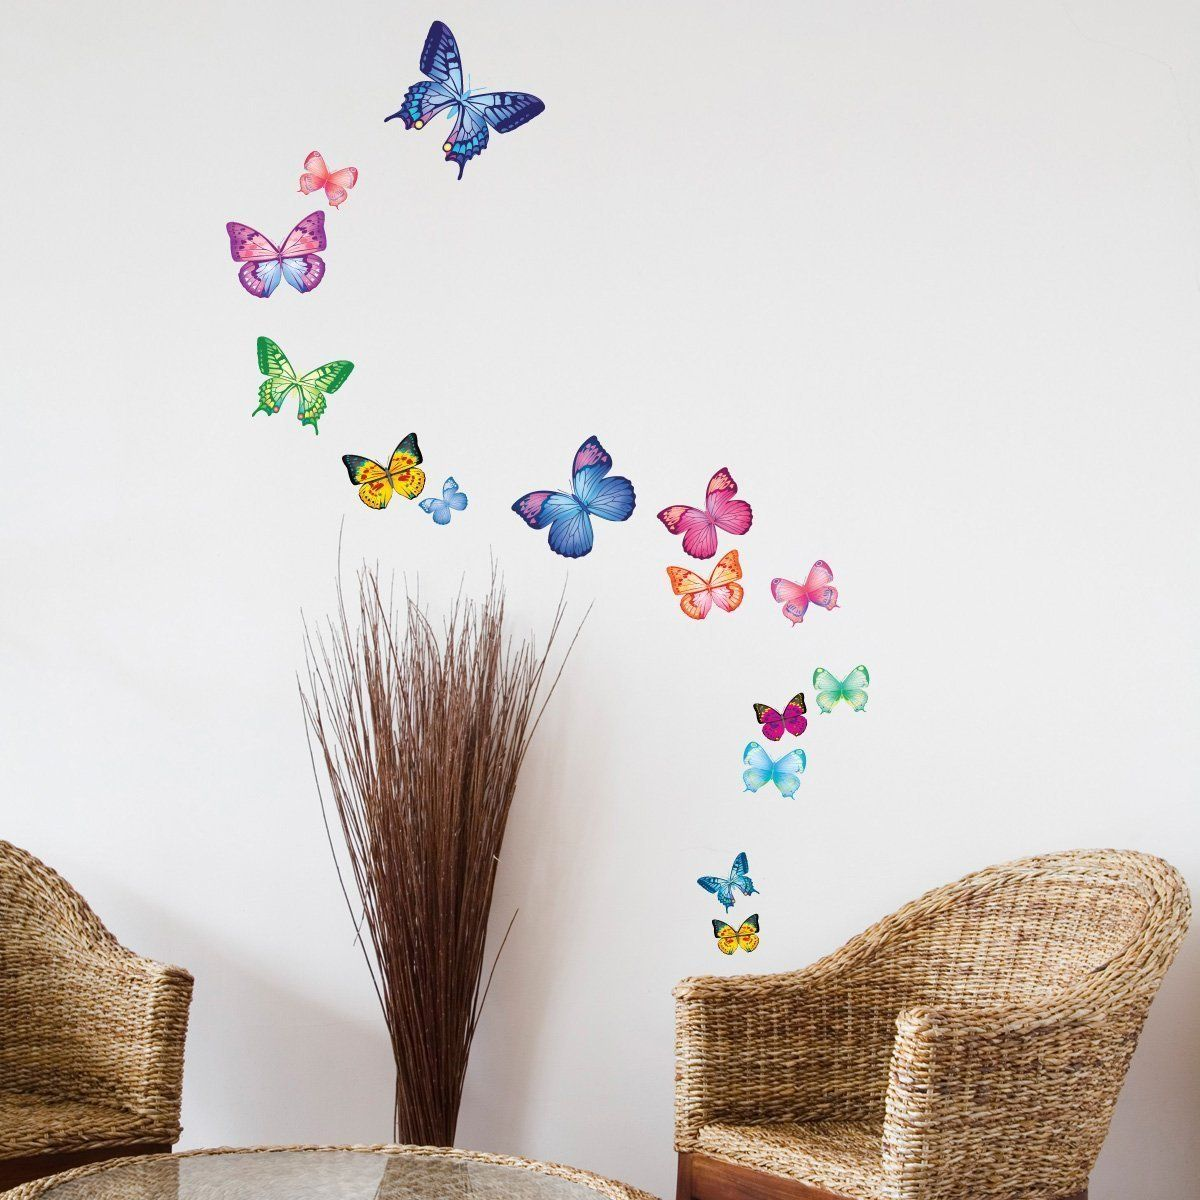 decowall dw 1302ac 15 vibrant papillons stickers muraux tatouages muraux transferts mur. Black Bedroom Furniture Sets. Home Design Ideas